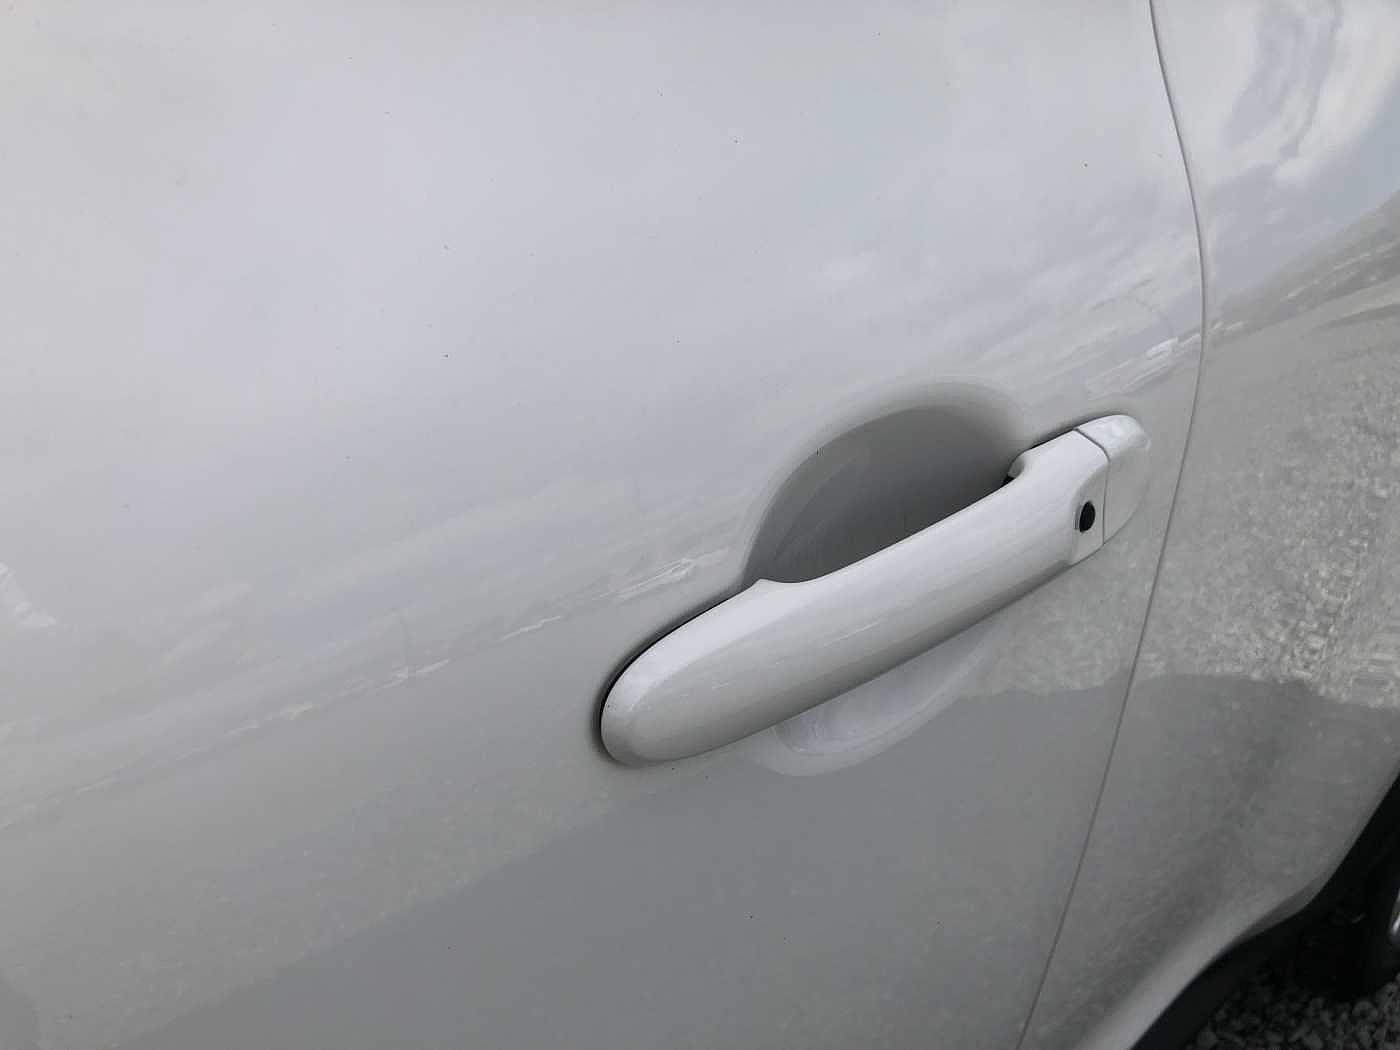 Nissan Juke 1.2 DIG-T N-Connecta 5-Door Hatchback